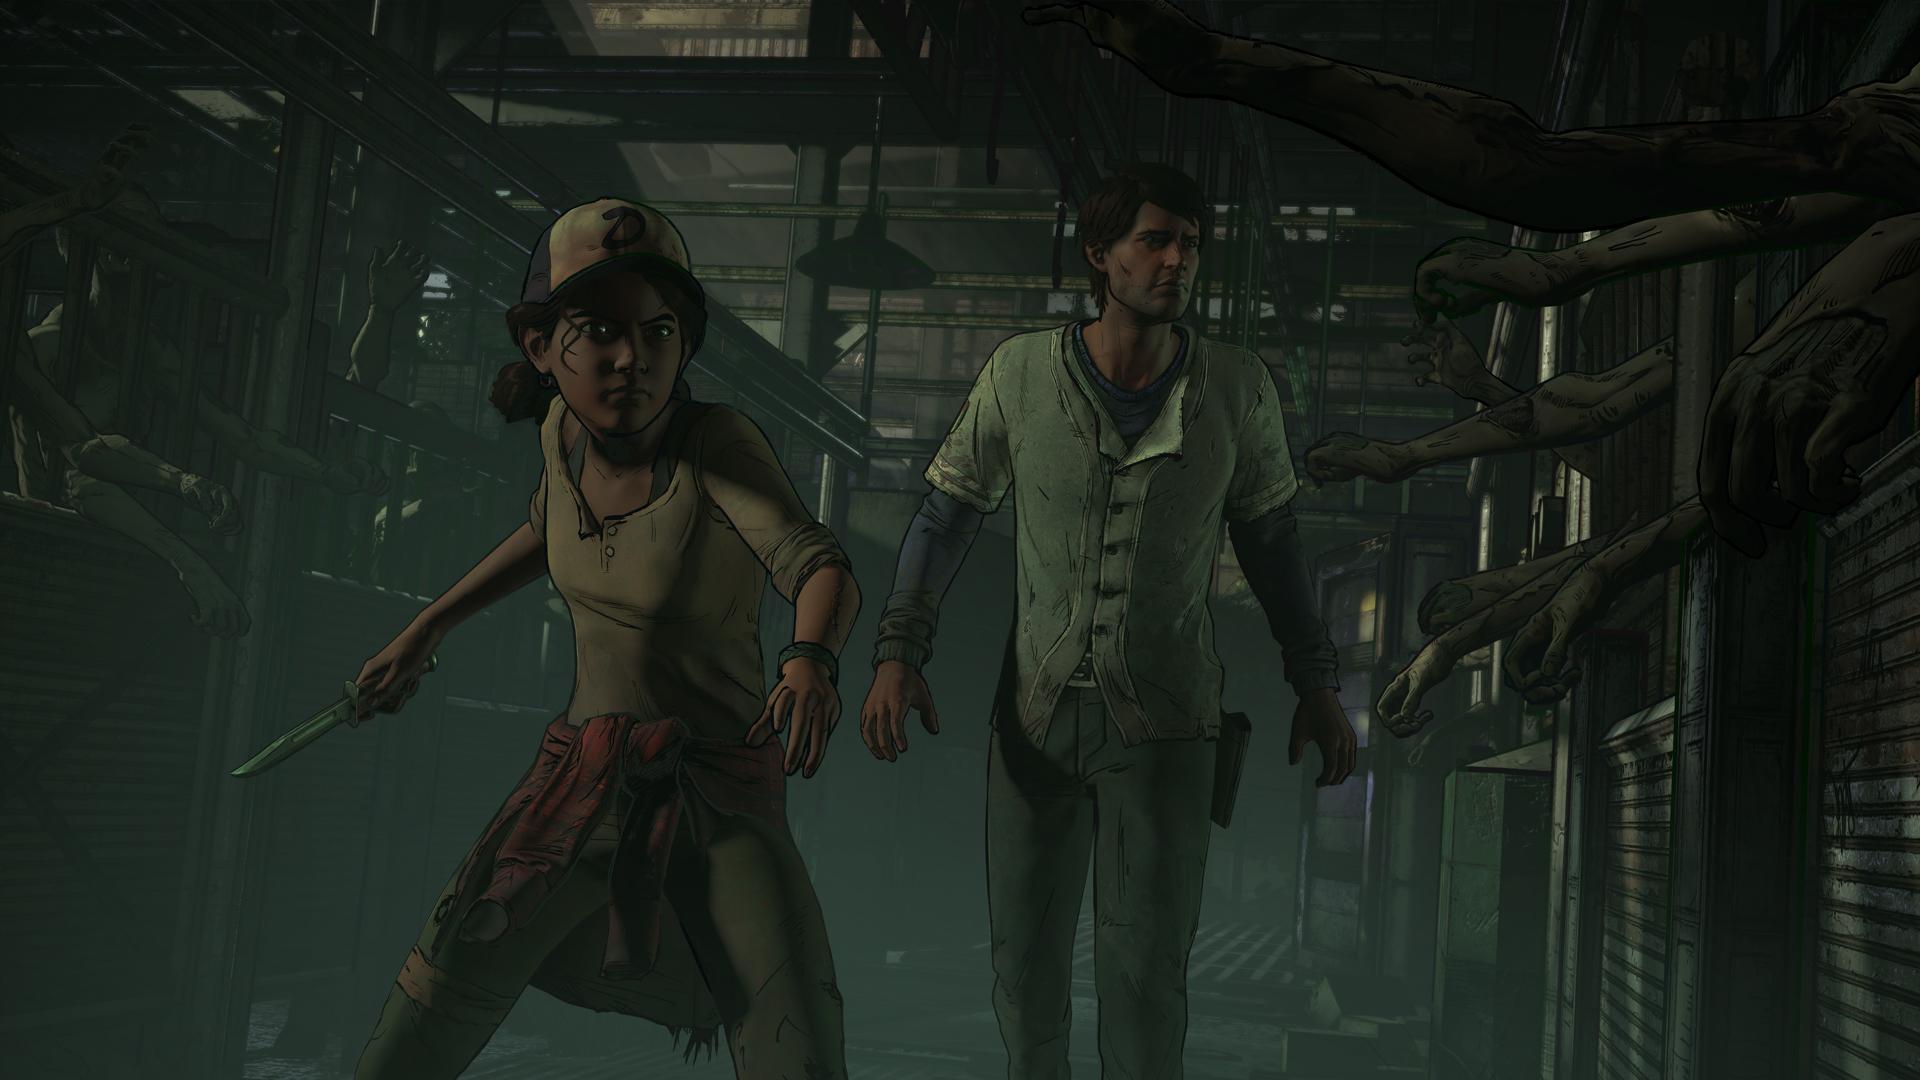 Třetí série The Walking Dead na nových screenshotech 127538